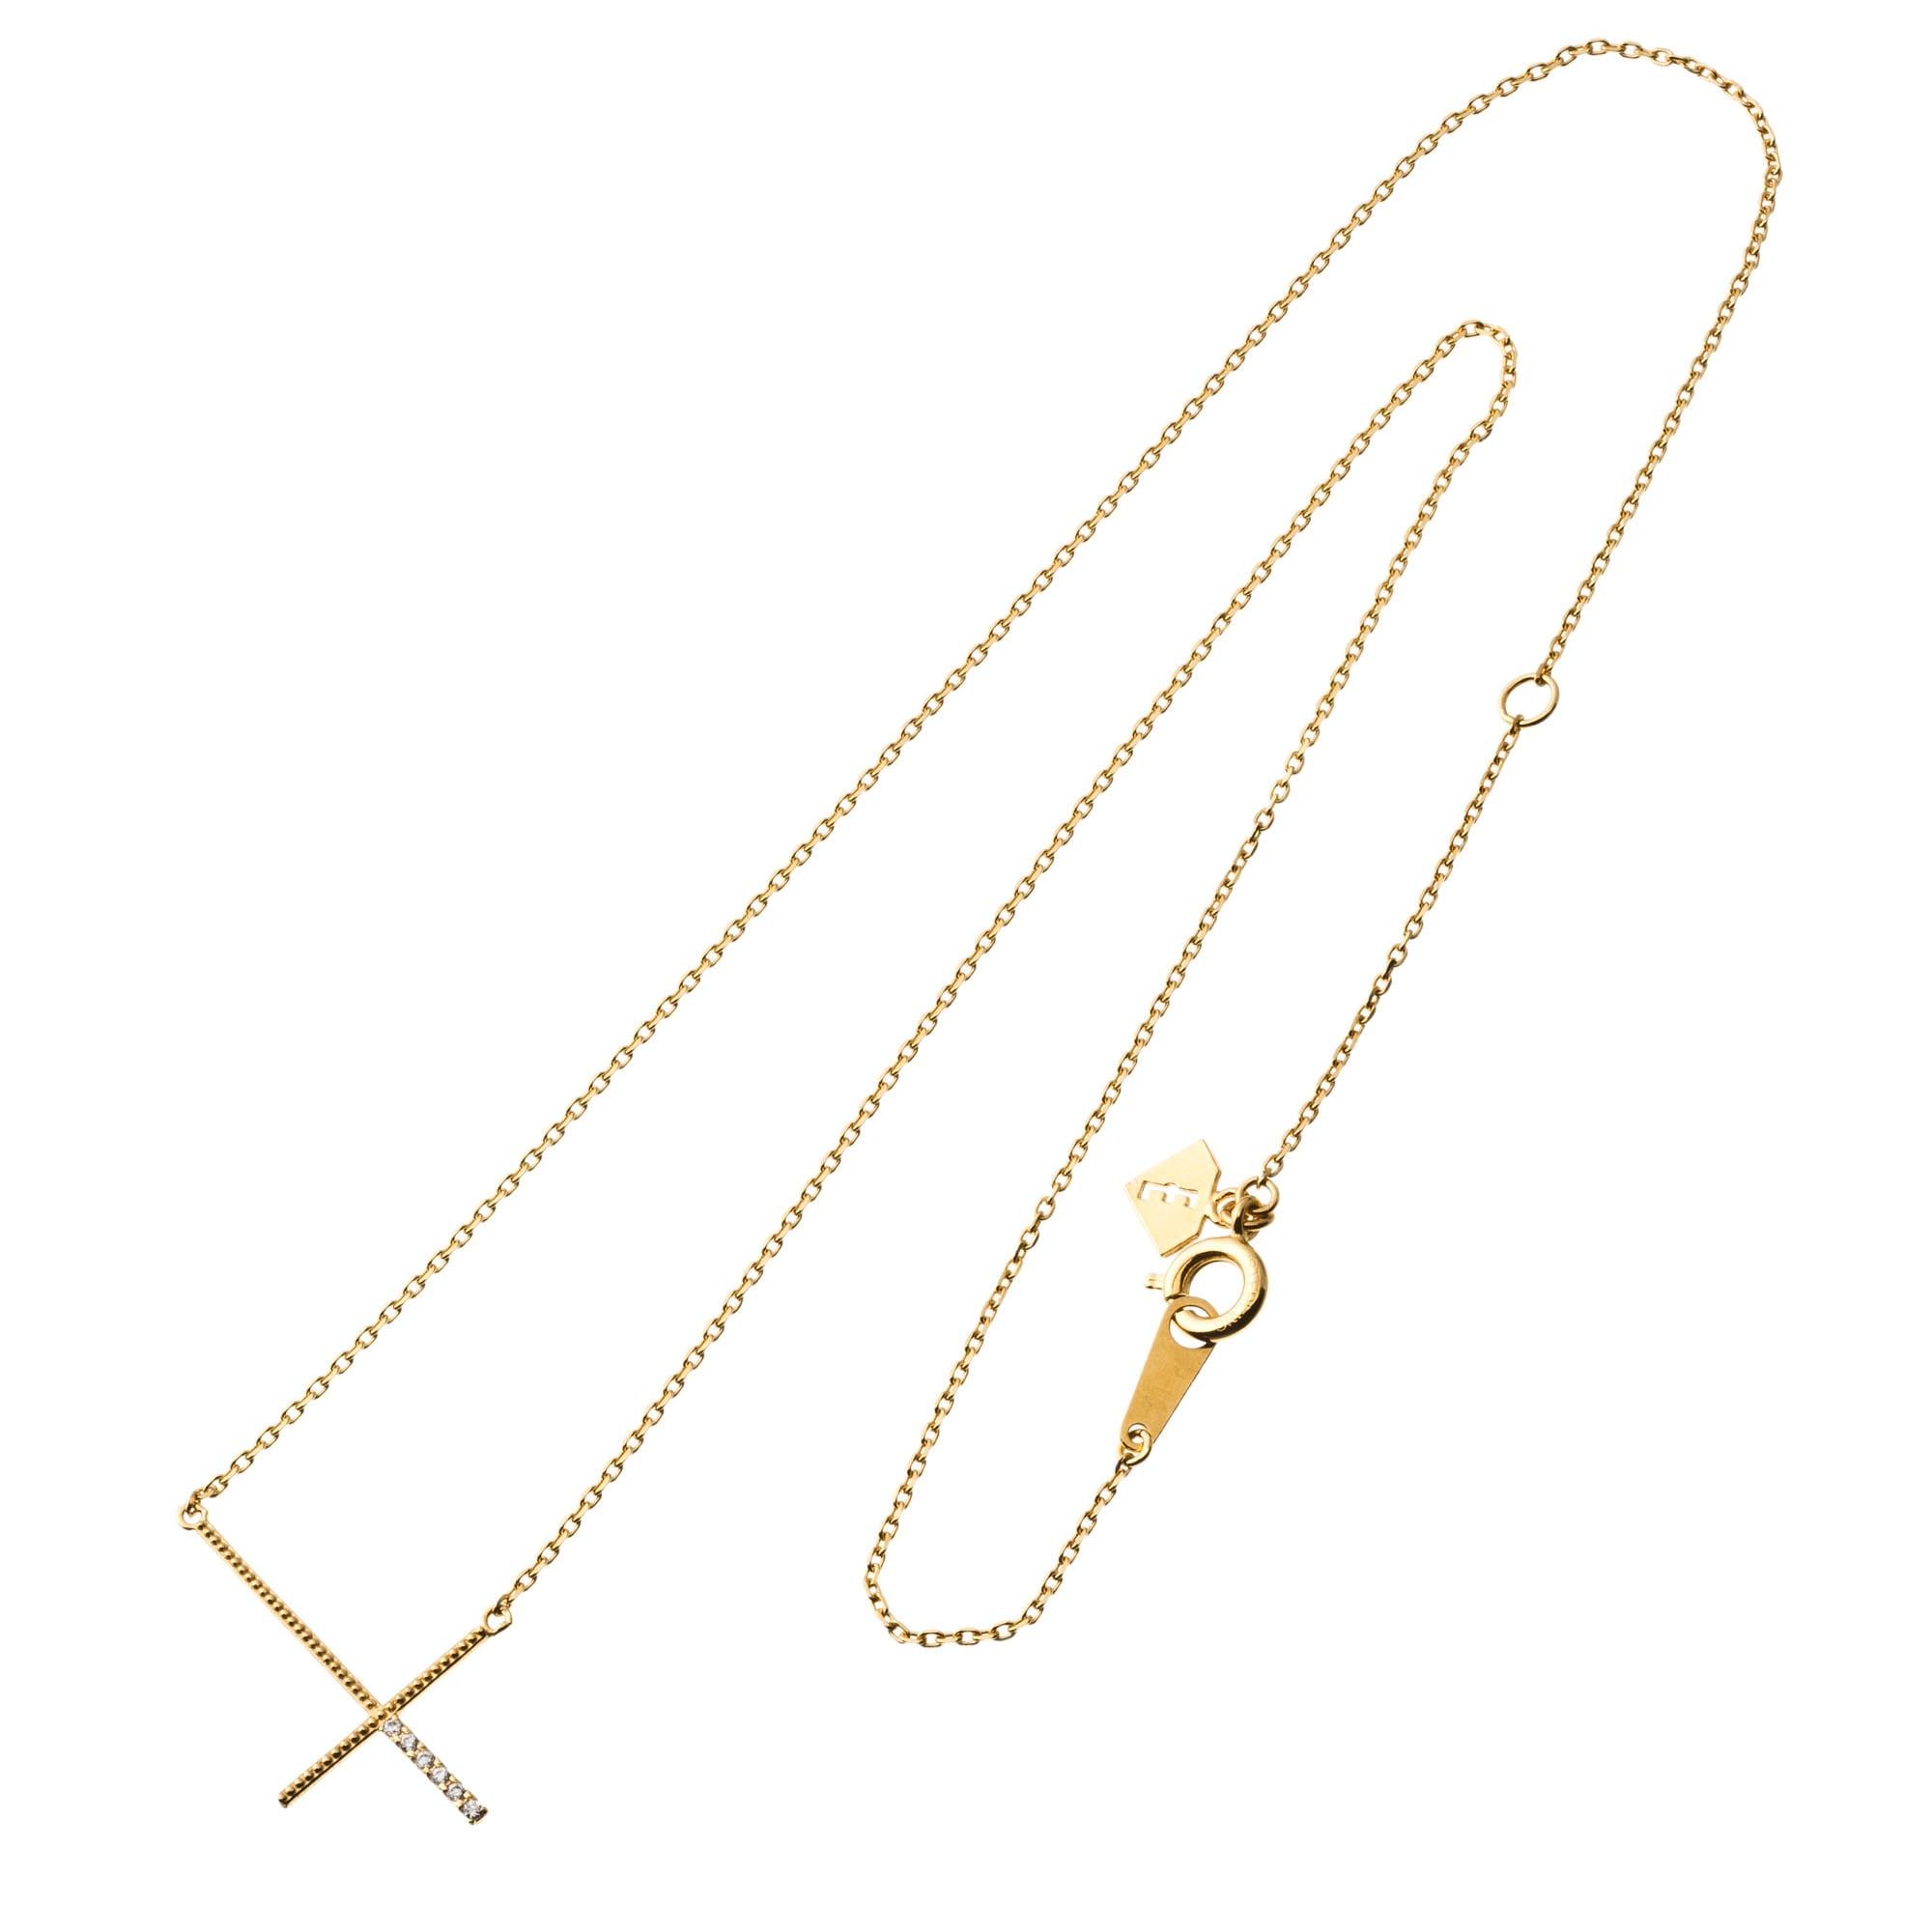 Reverse cross necklace リバースクロスネックレス ELP0006SG